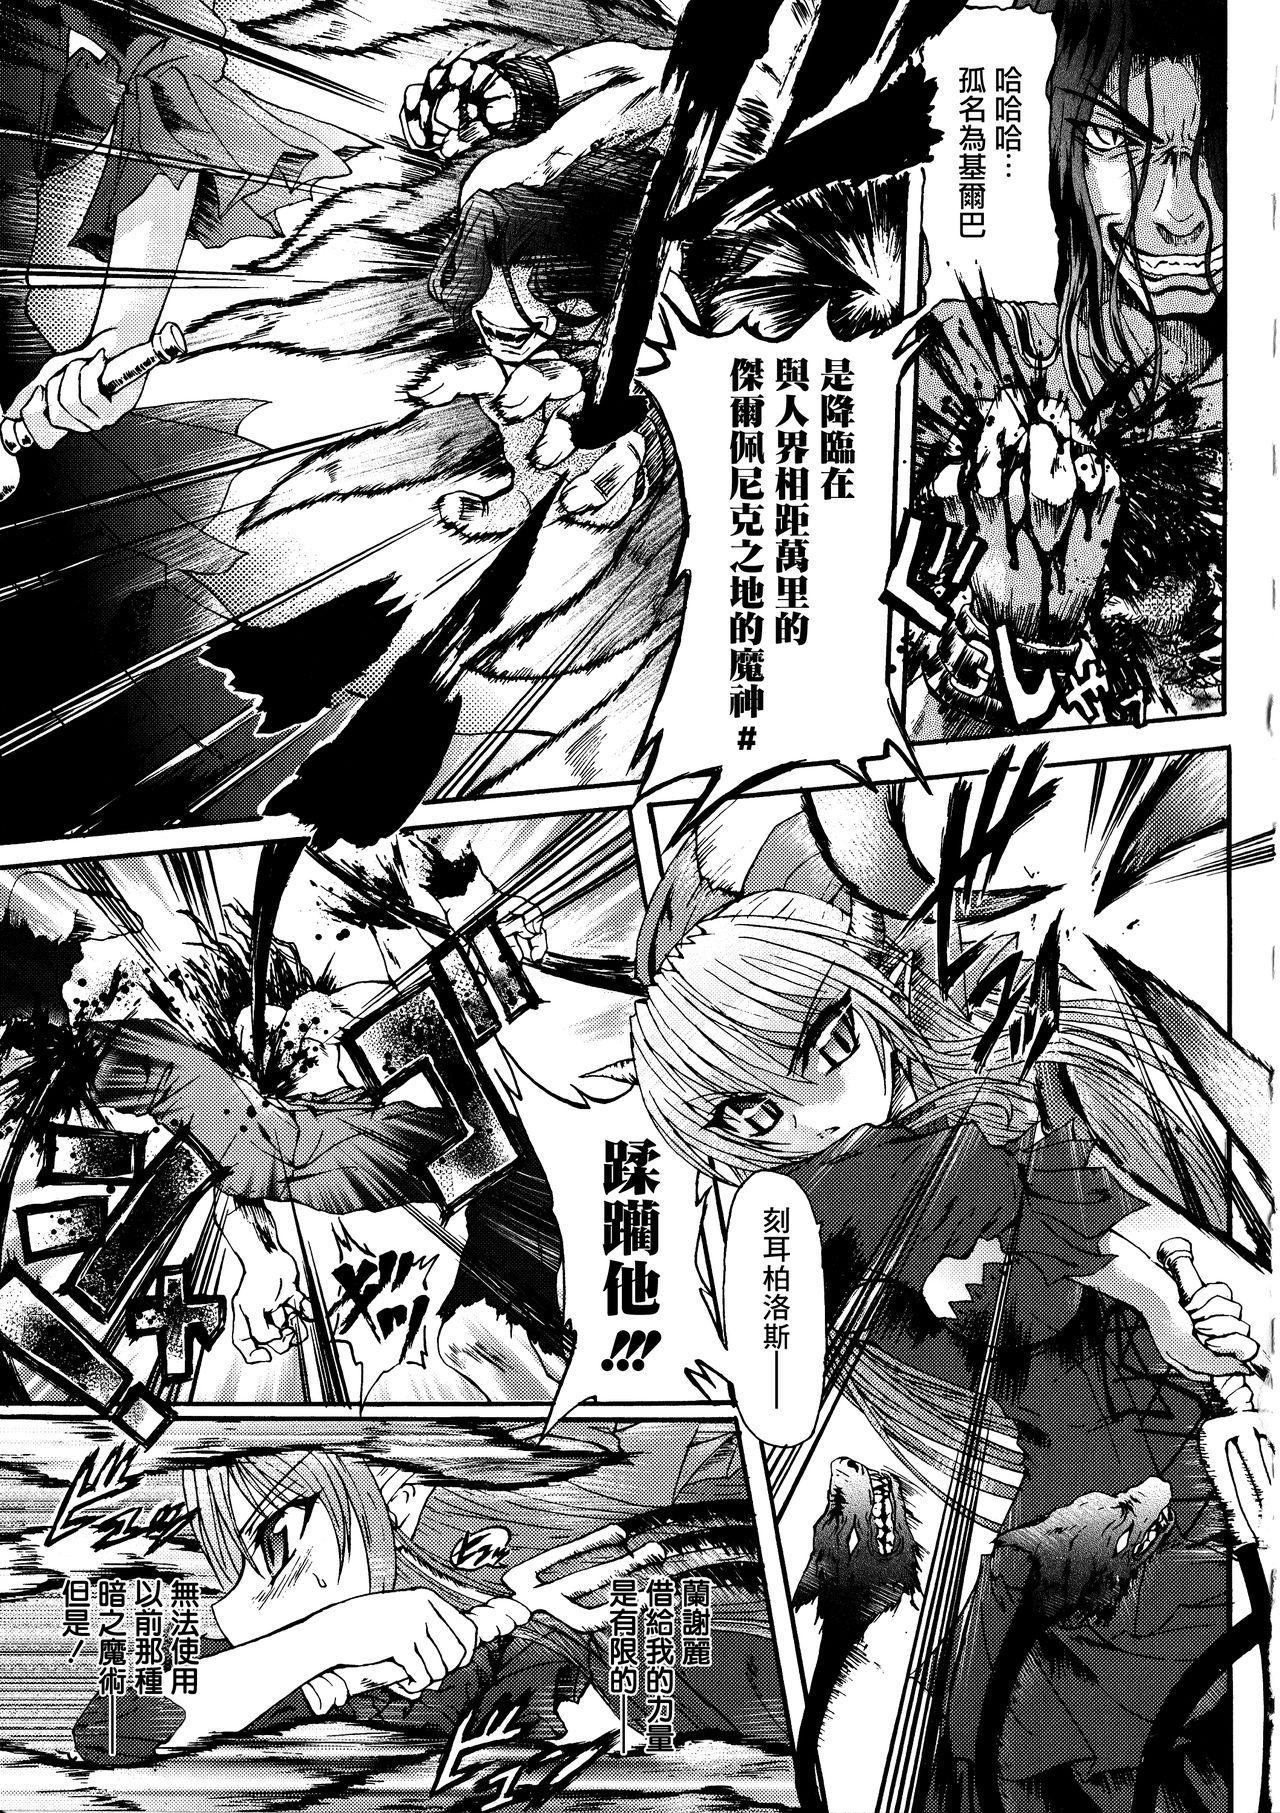 Ma ga Ochiru Yoru Demonic Imitator CH.1-7 127